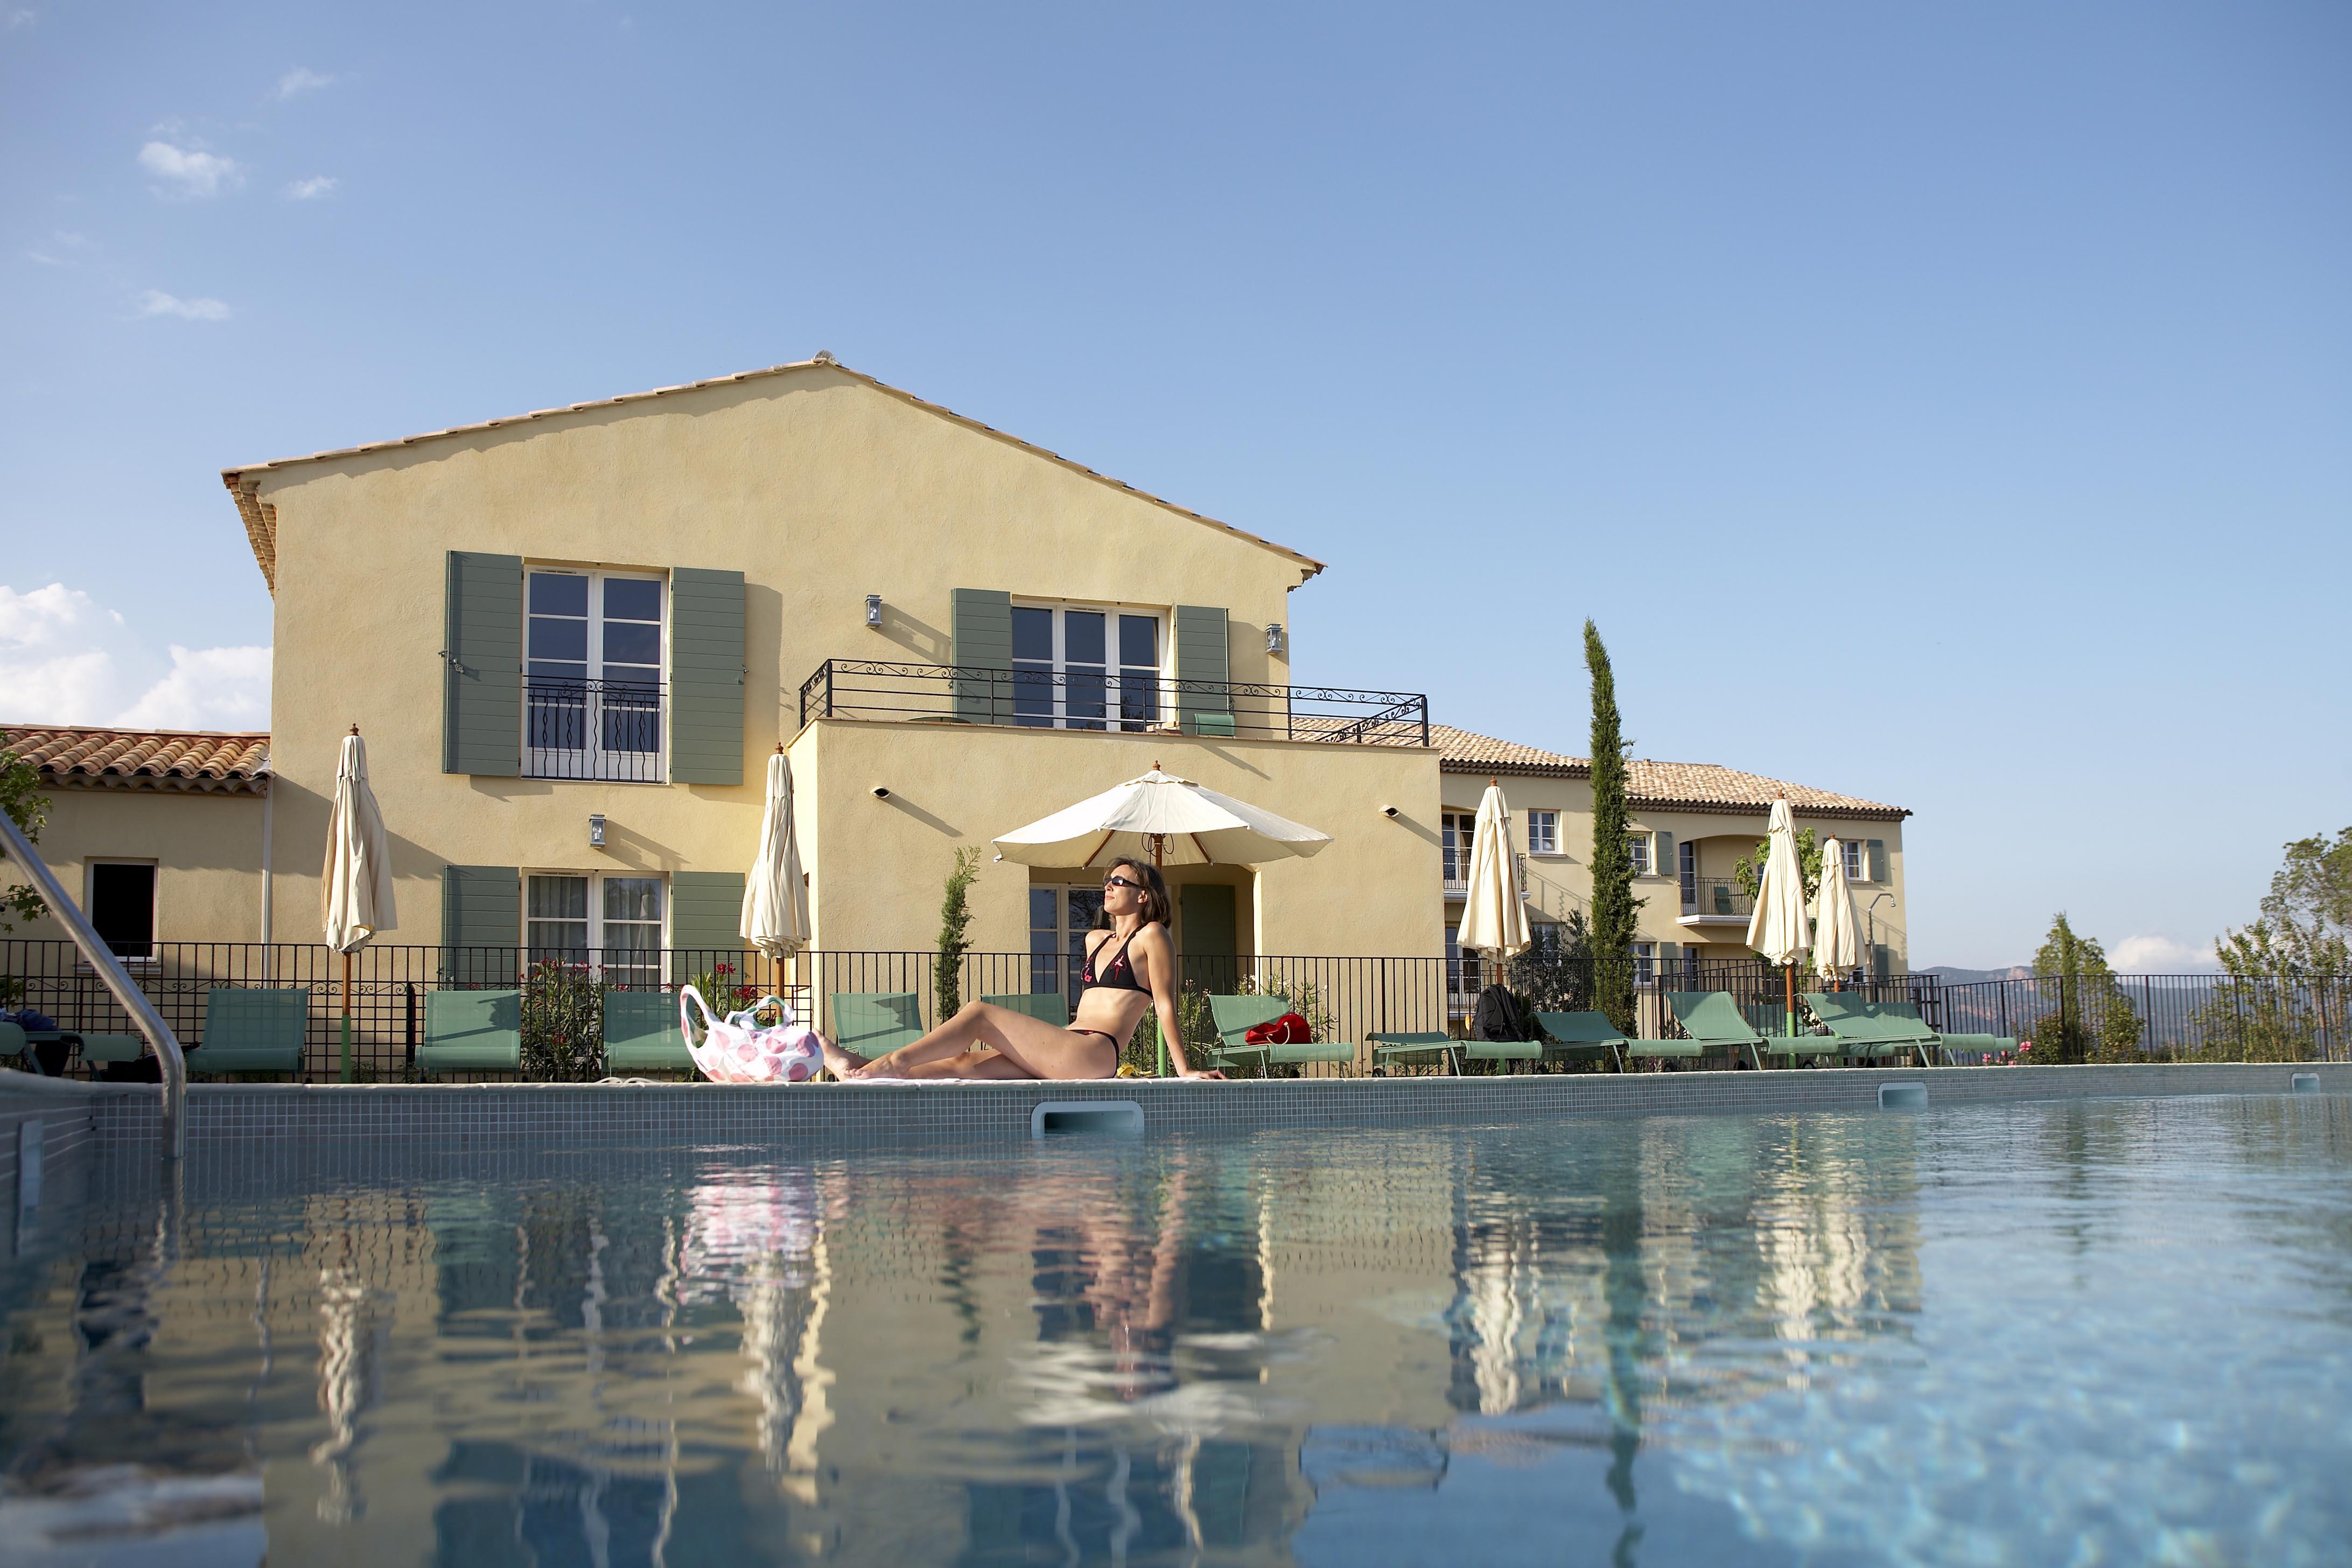 golf-expedition-golf-reizen-frankrijk-regio-cote-d'azur-Les-Domaines-de-Saint-Endréol-Golf-en-Spa-Resort-zwembad-met-villa-op-achtergrond